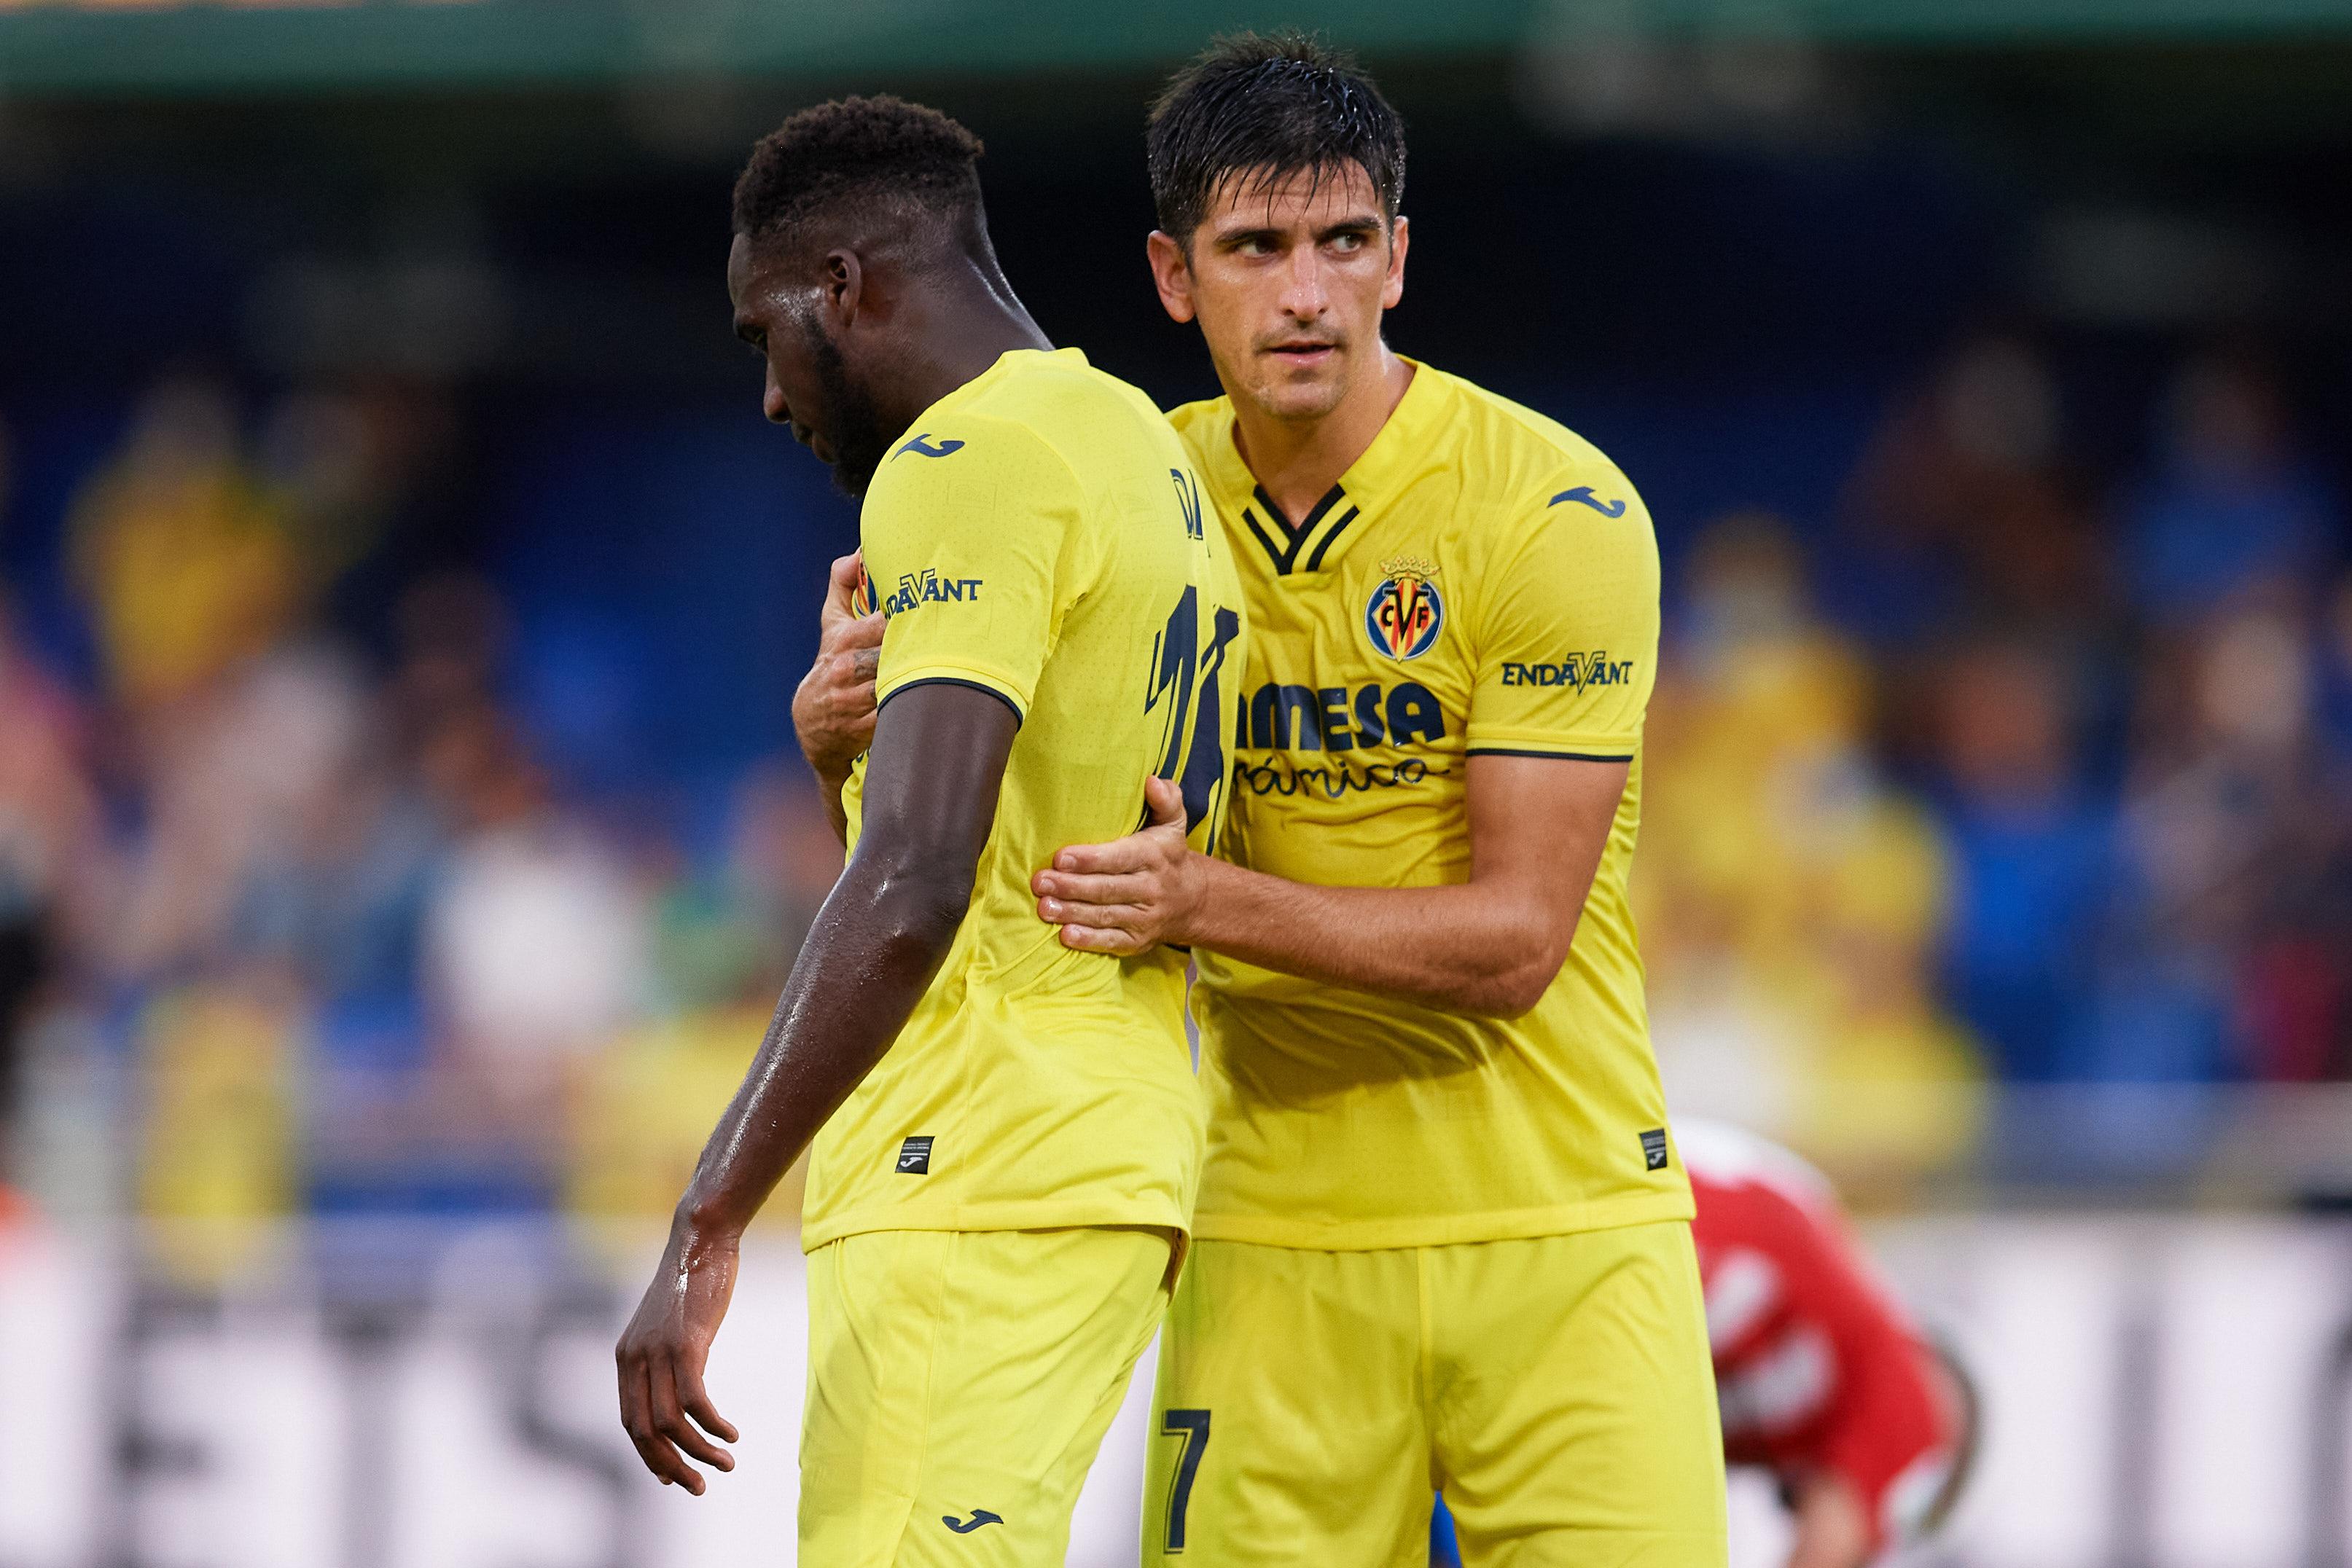 Villarreal CF v Granada CF - La Liga Santander